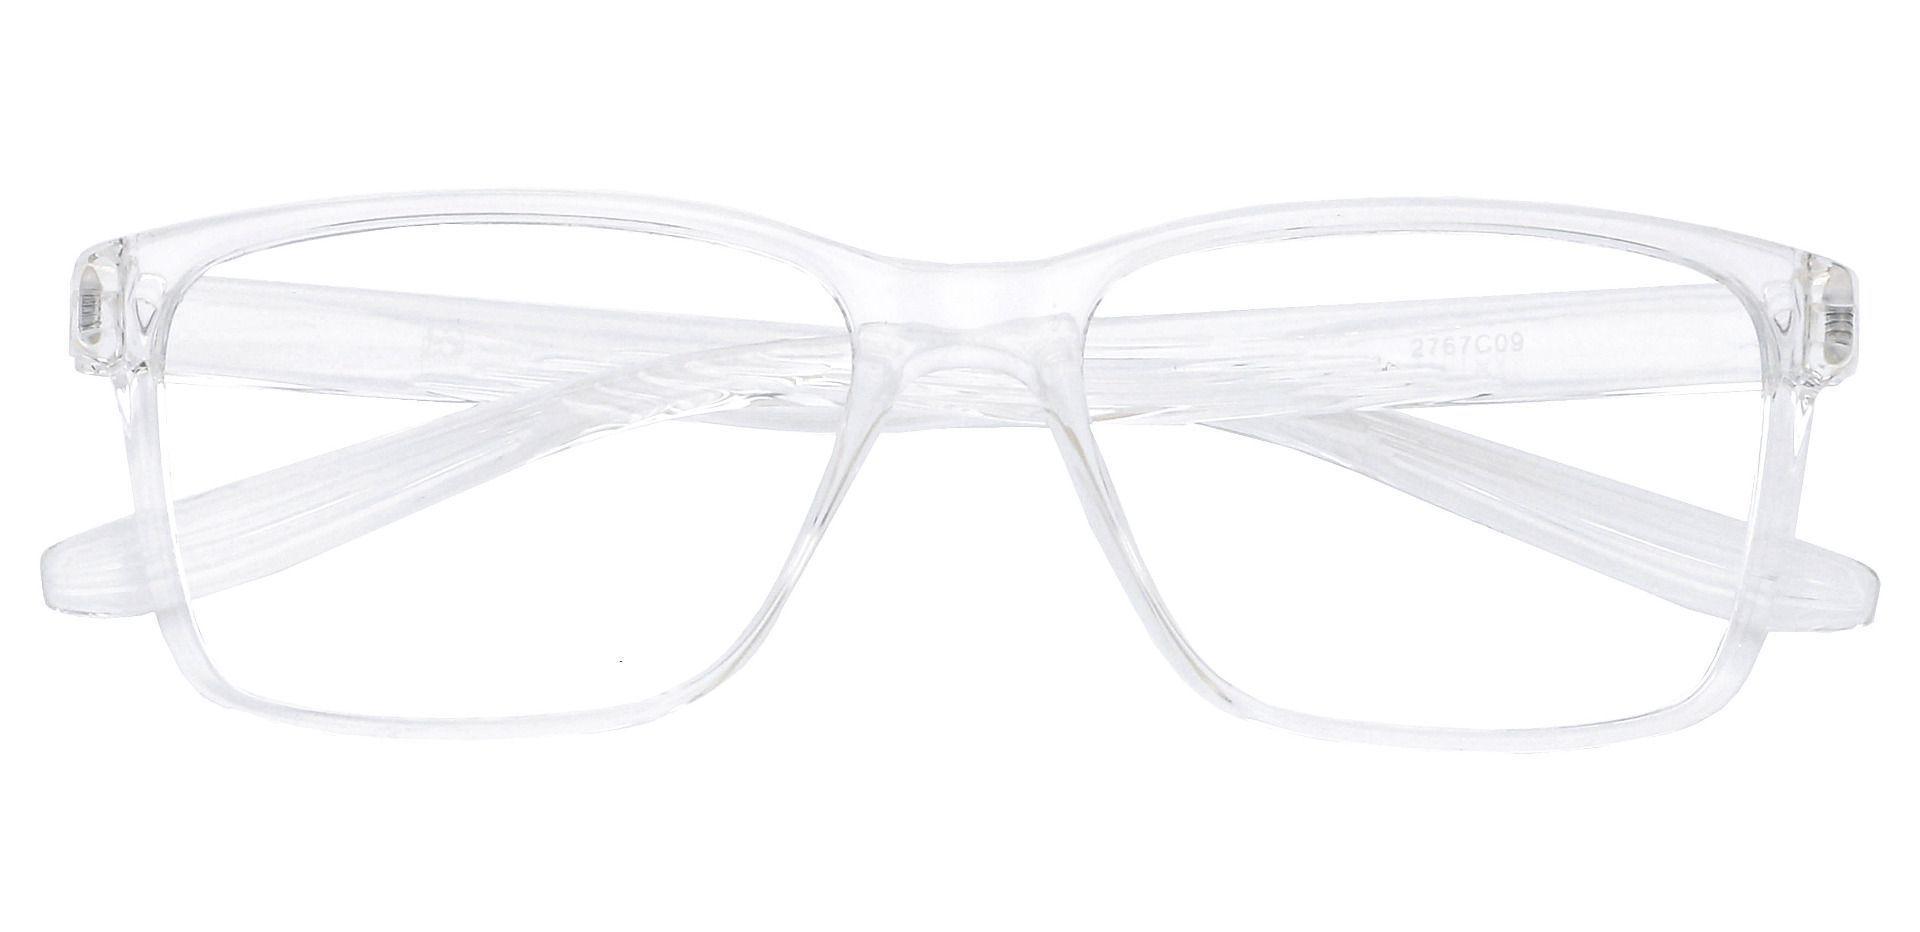 Berlin Rectangle Blue Light Blocking Glasses - Clear